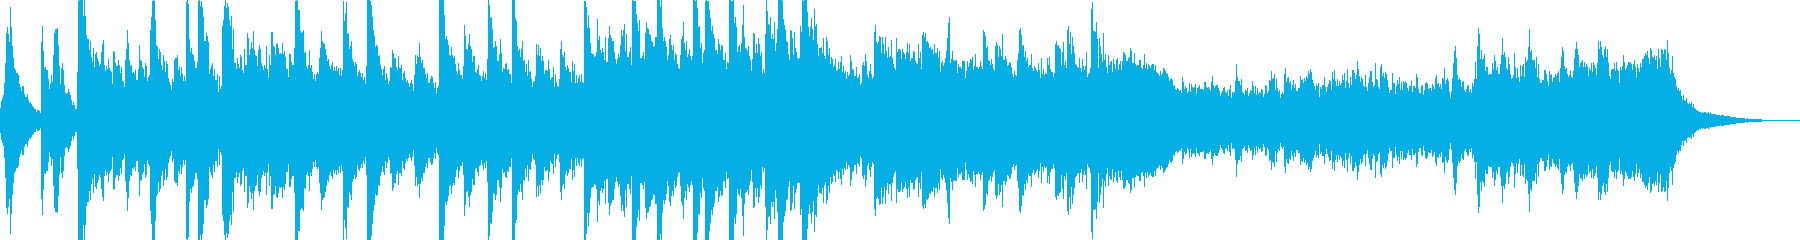 KANT恐怖のクリスマスlongの再生済みの波形